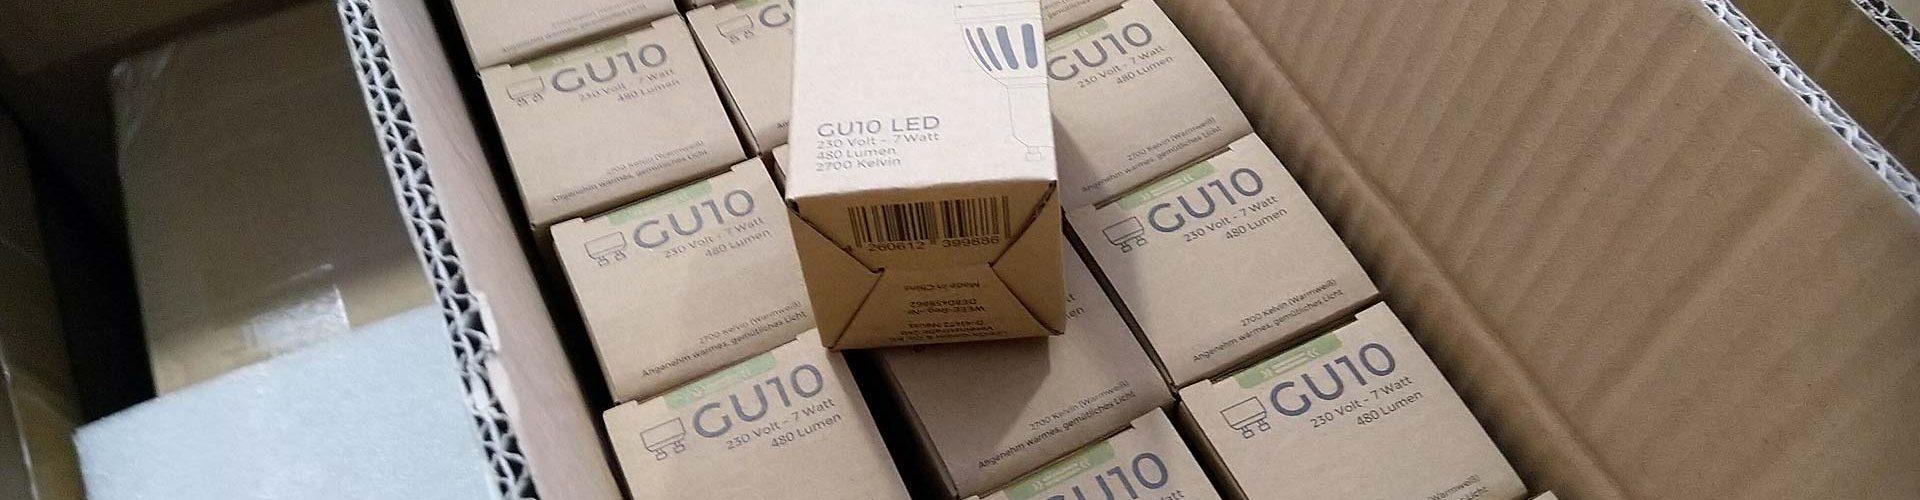 WELL.E.D. GU10-LEDs